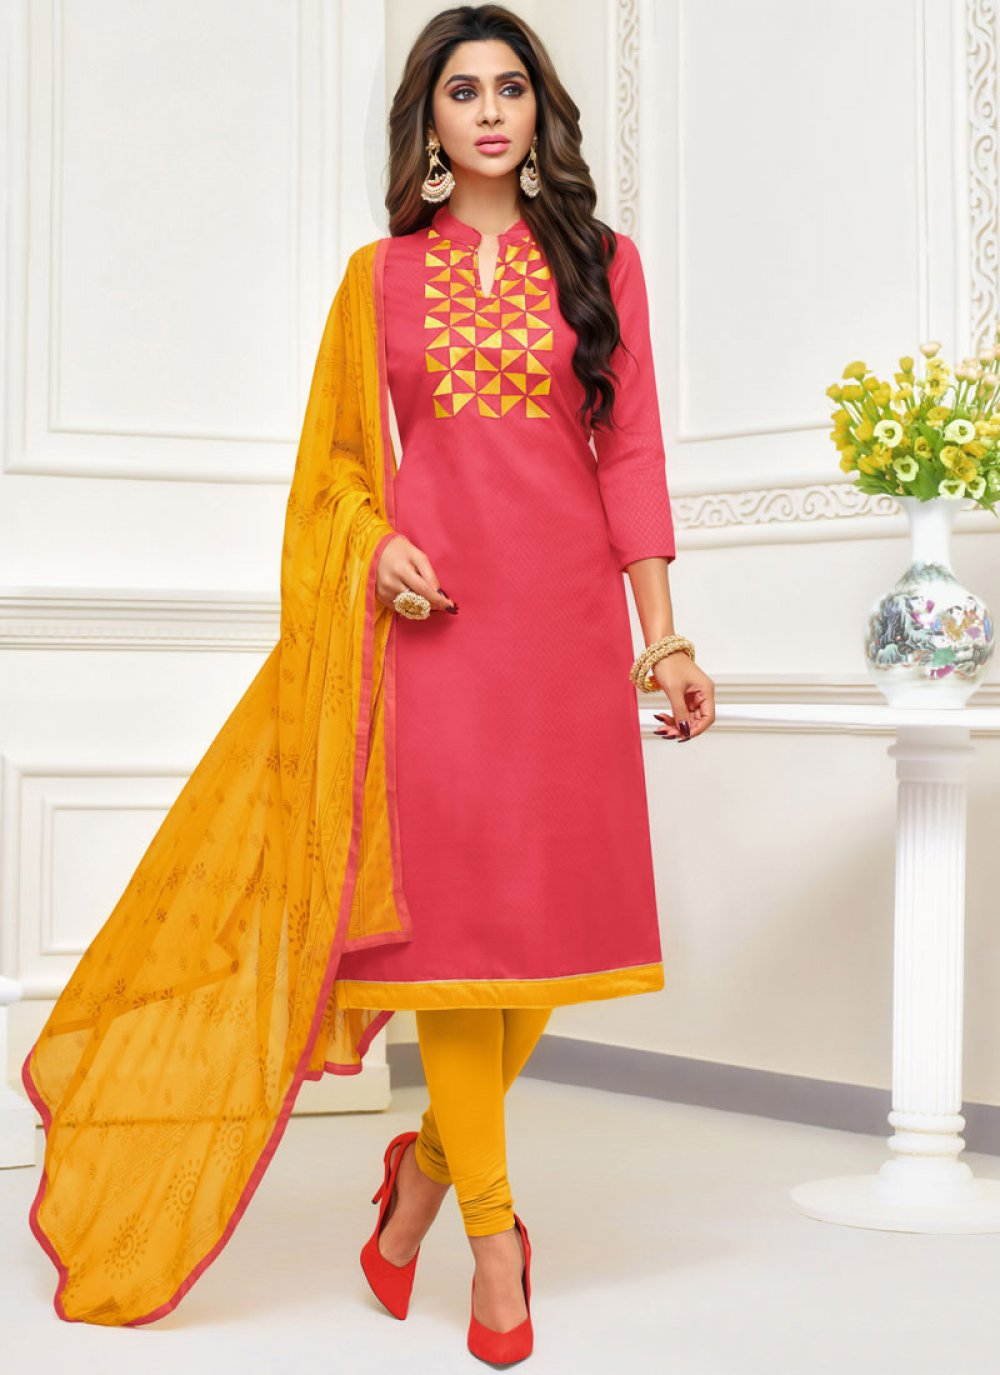 Jacquard Embroidered Salwar Kameez in Peach